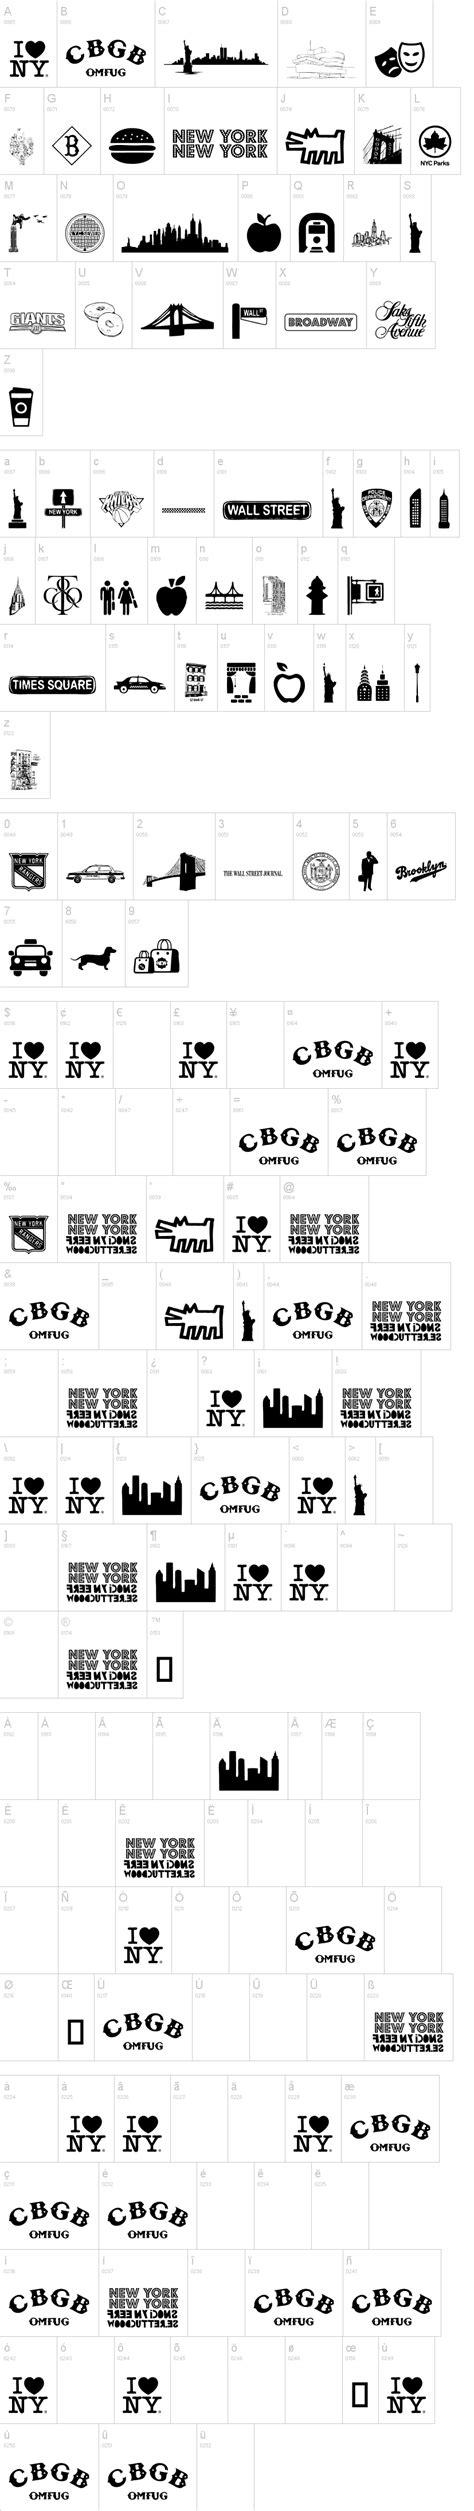 dafont new new york new york 2 font dafont com